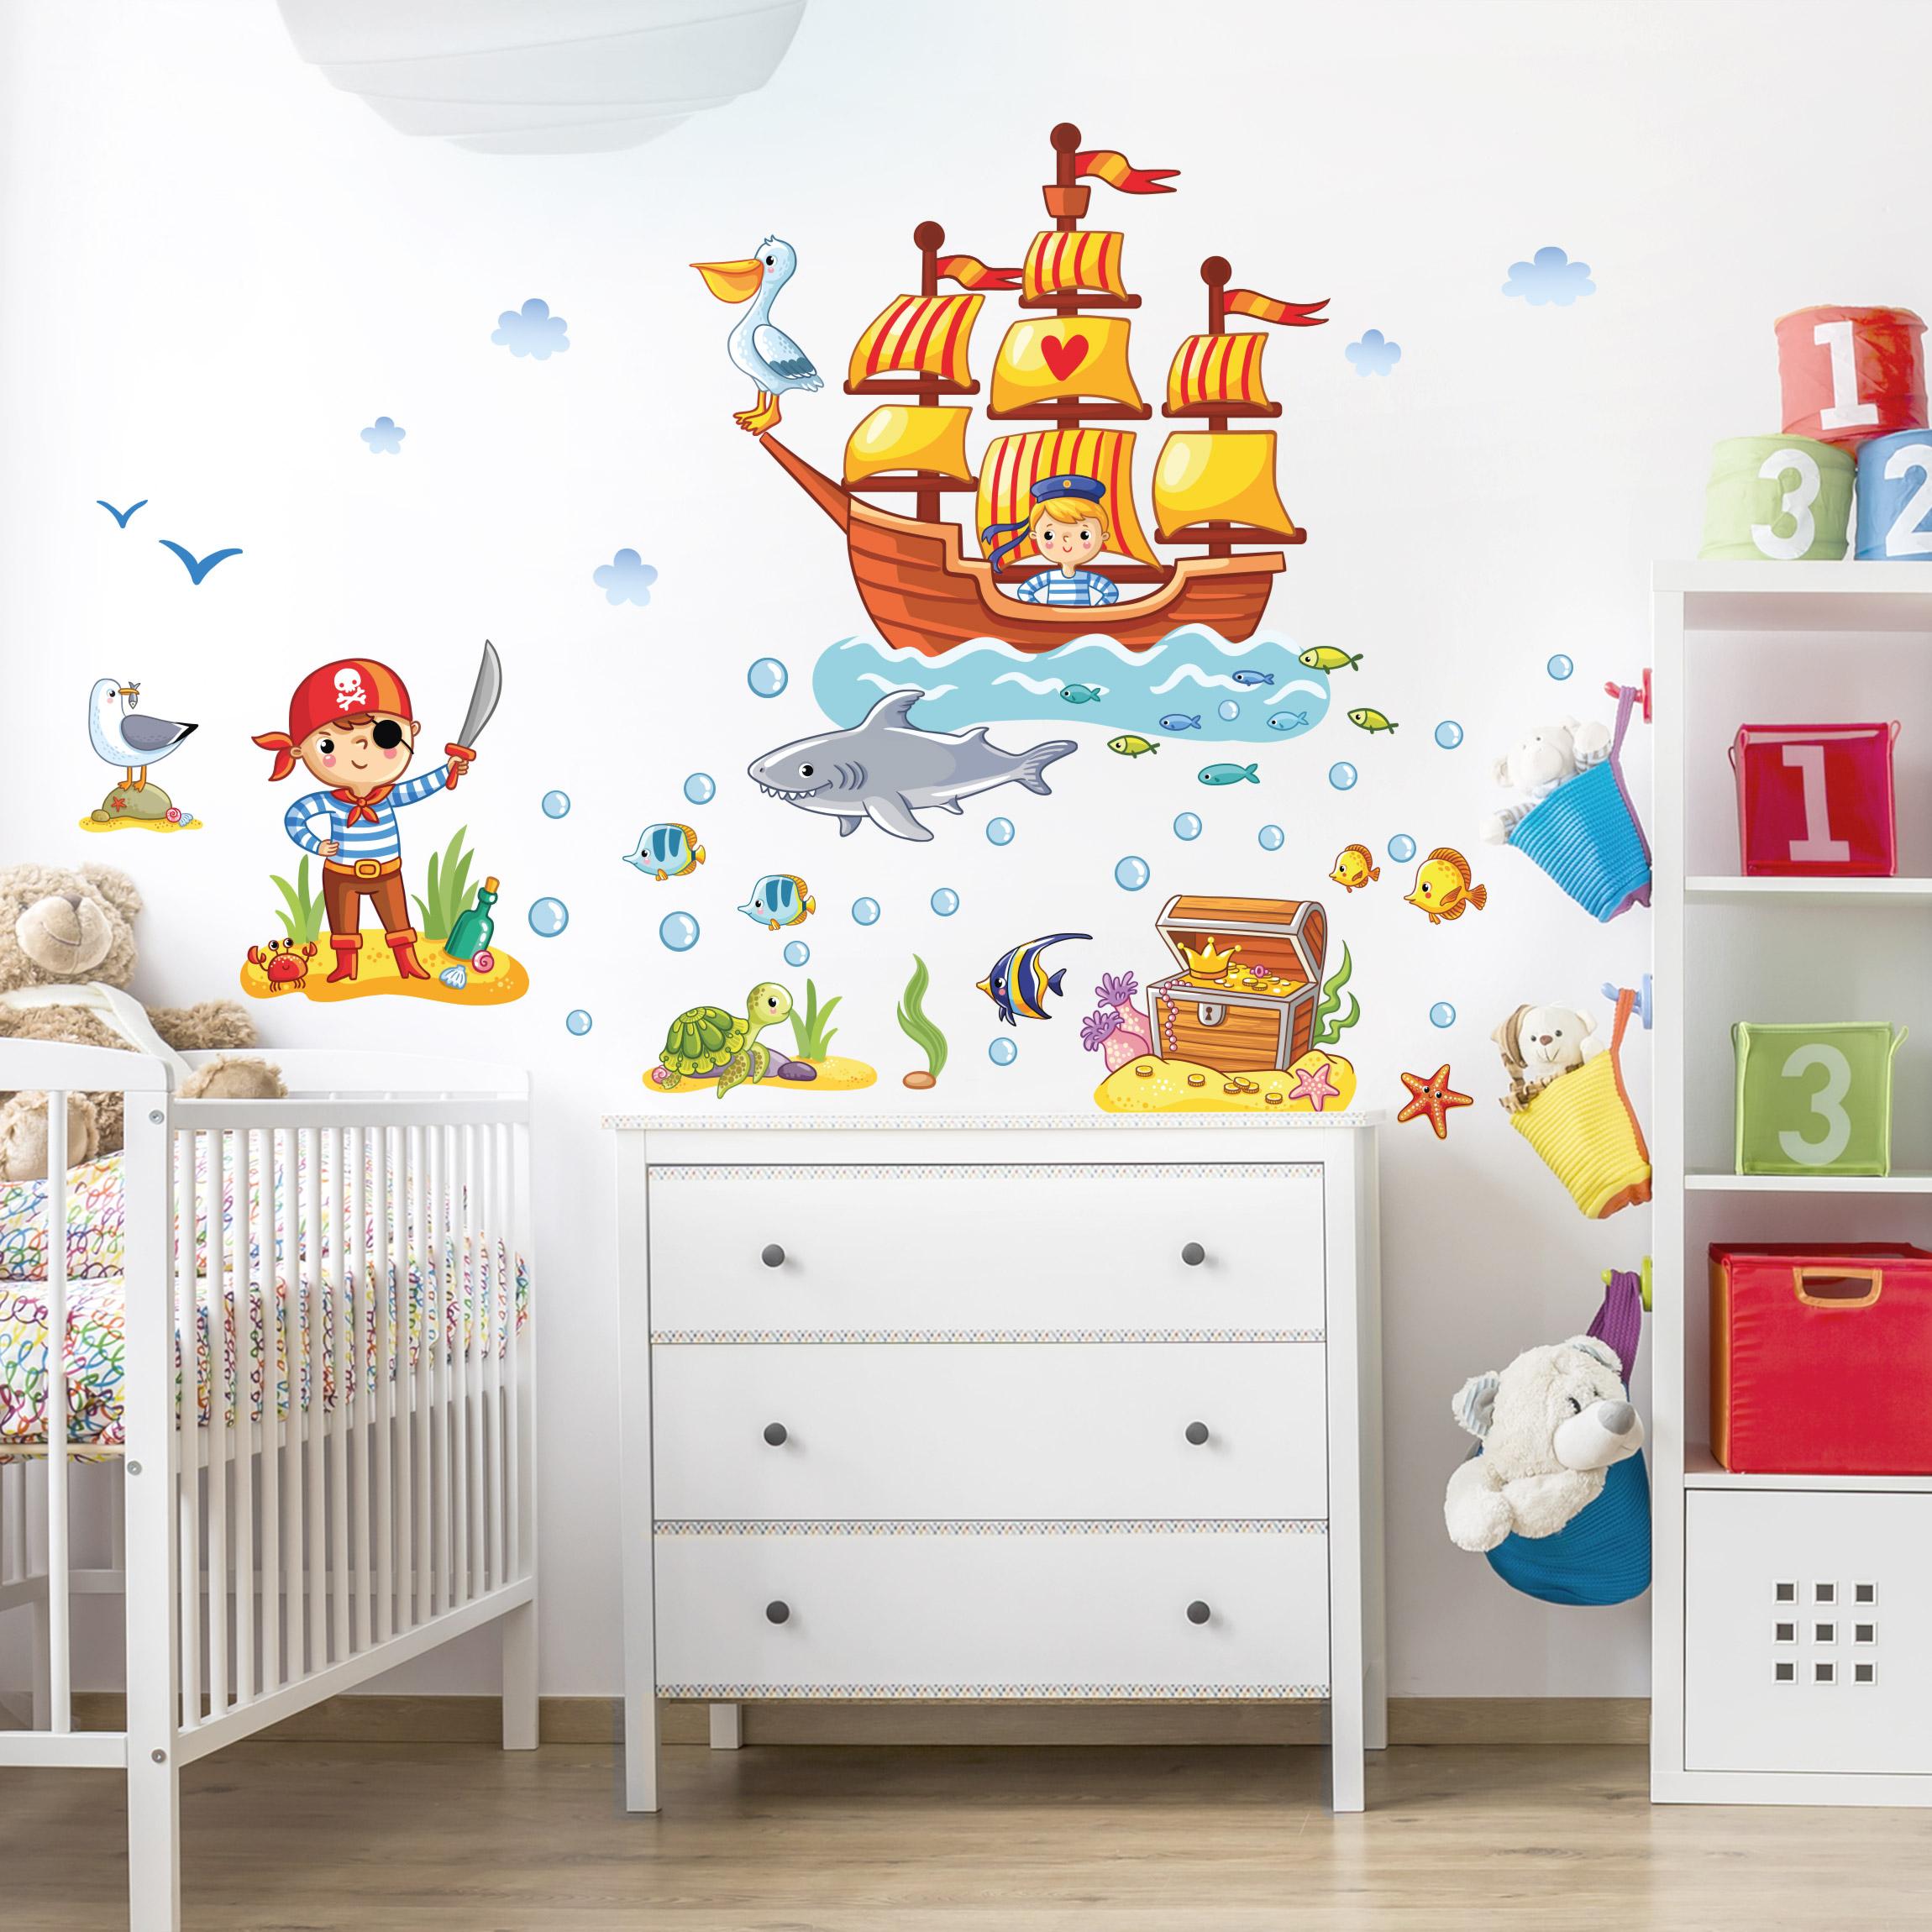 Full Size of Piraten Kinderzimmer Wandtattoo Set Regal Sofa Weiß Regale Kinderzimmer Piraten Kinderzimmer